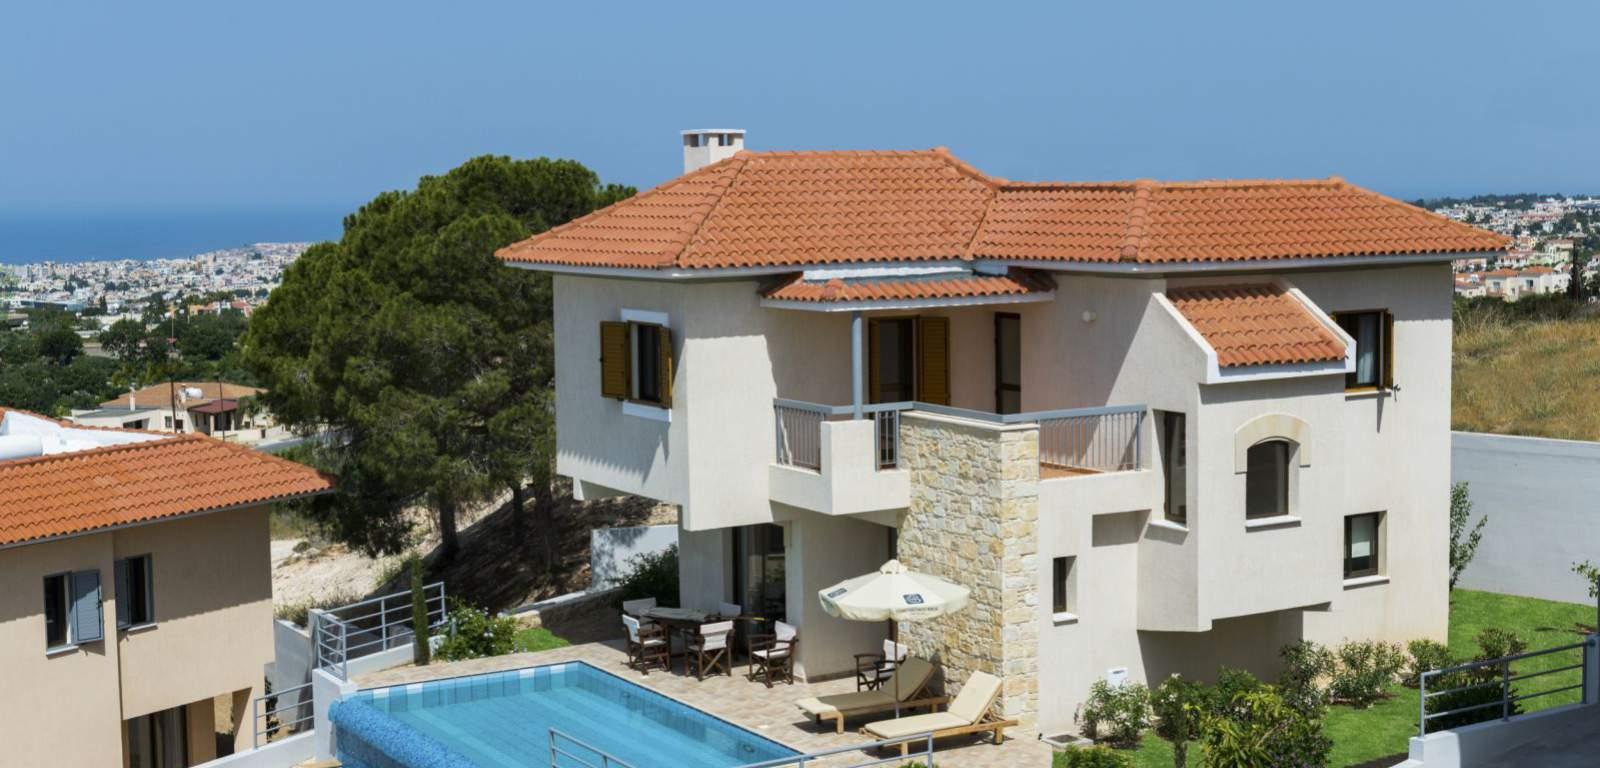 Villa 135 m² in Cyprus